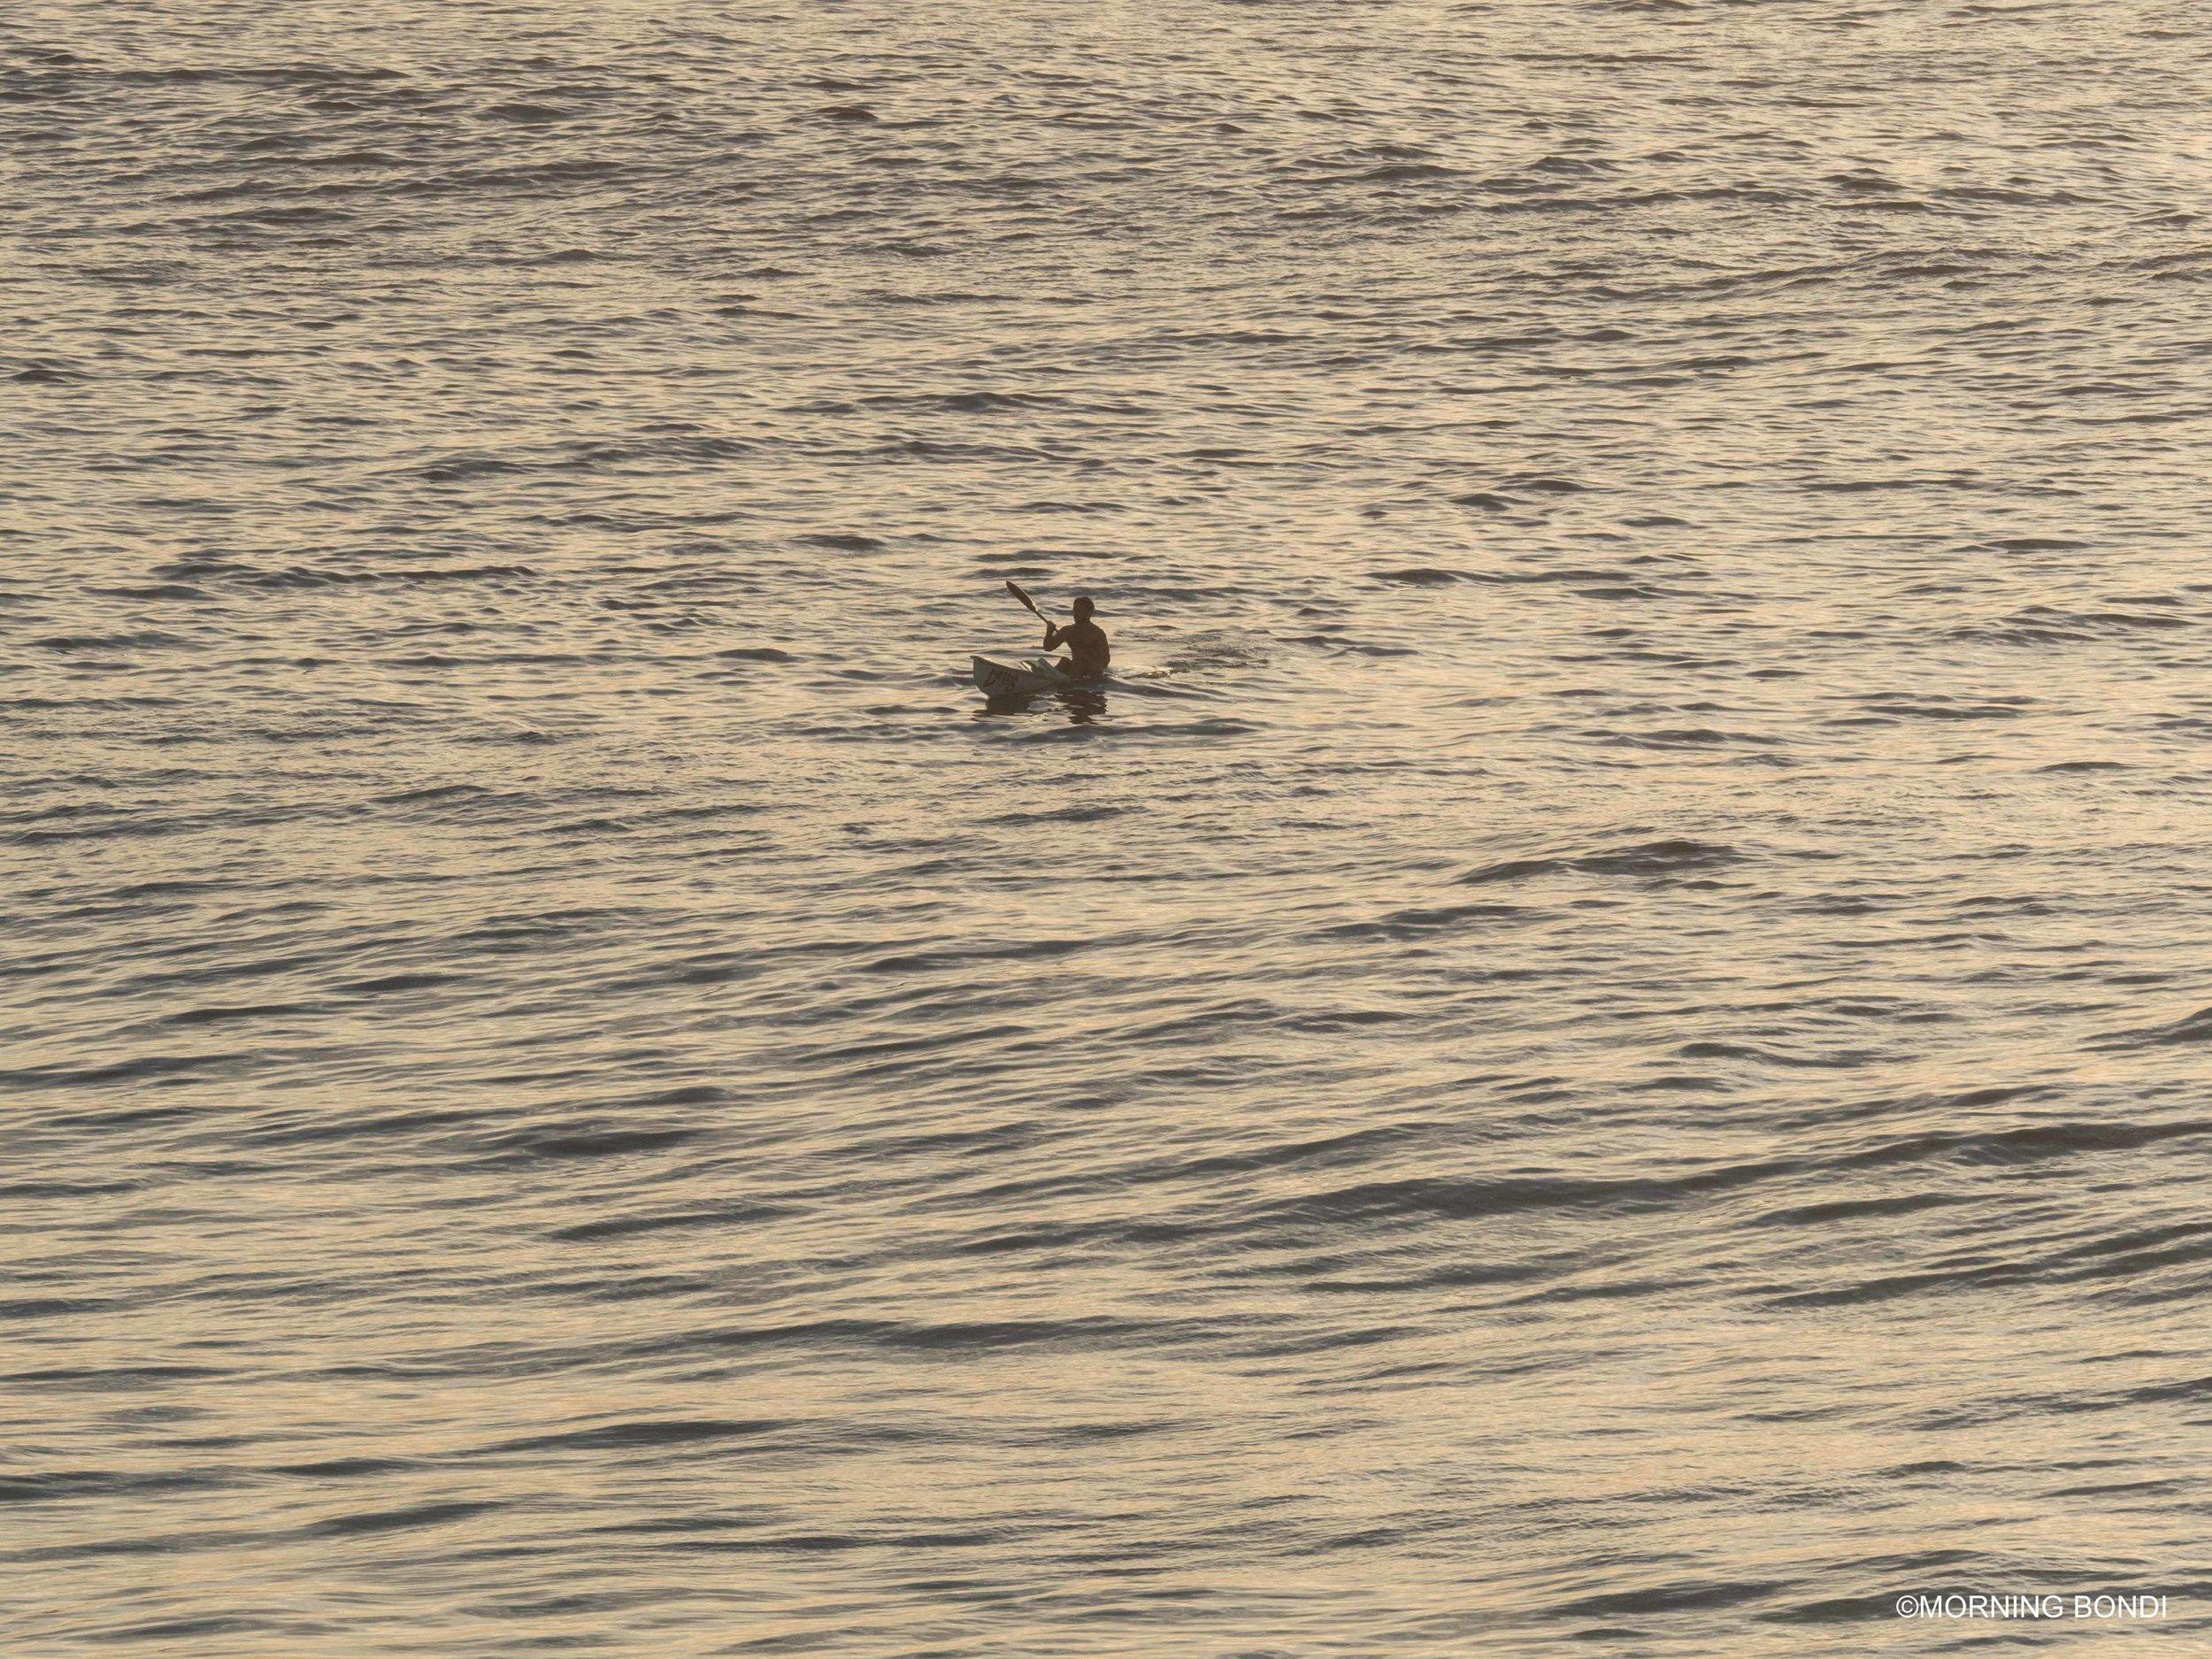 Sunrise paddle at its best